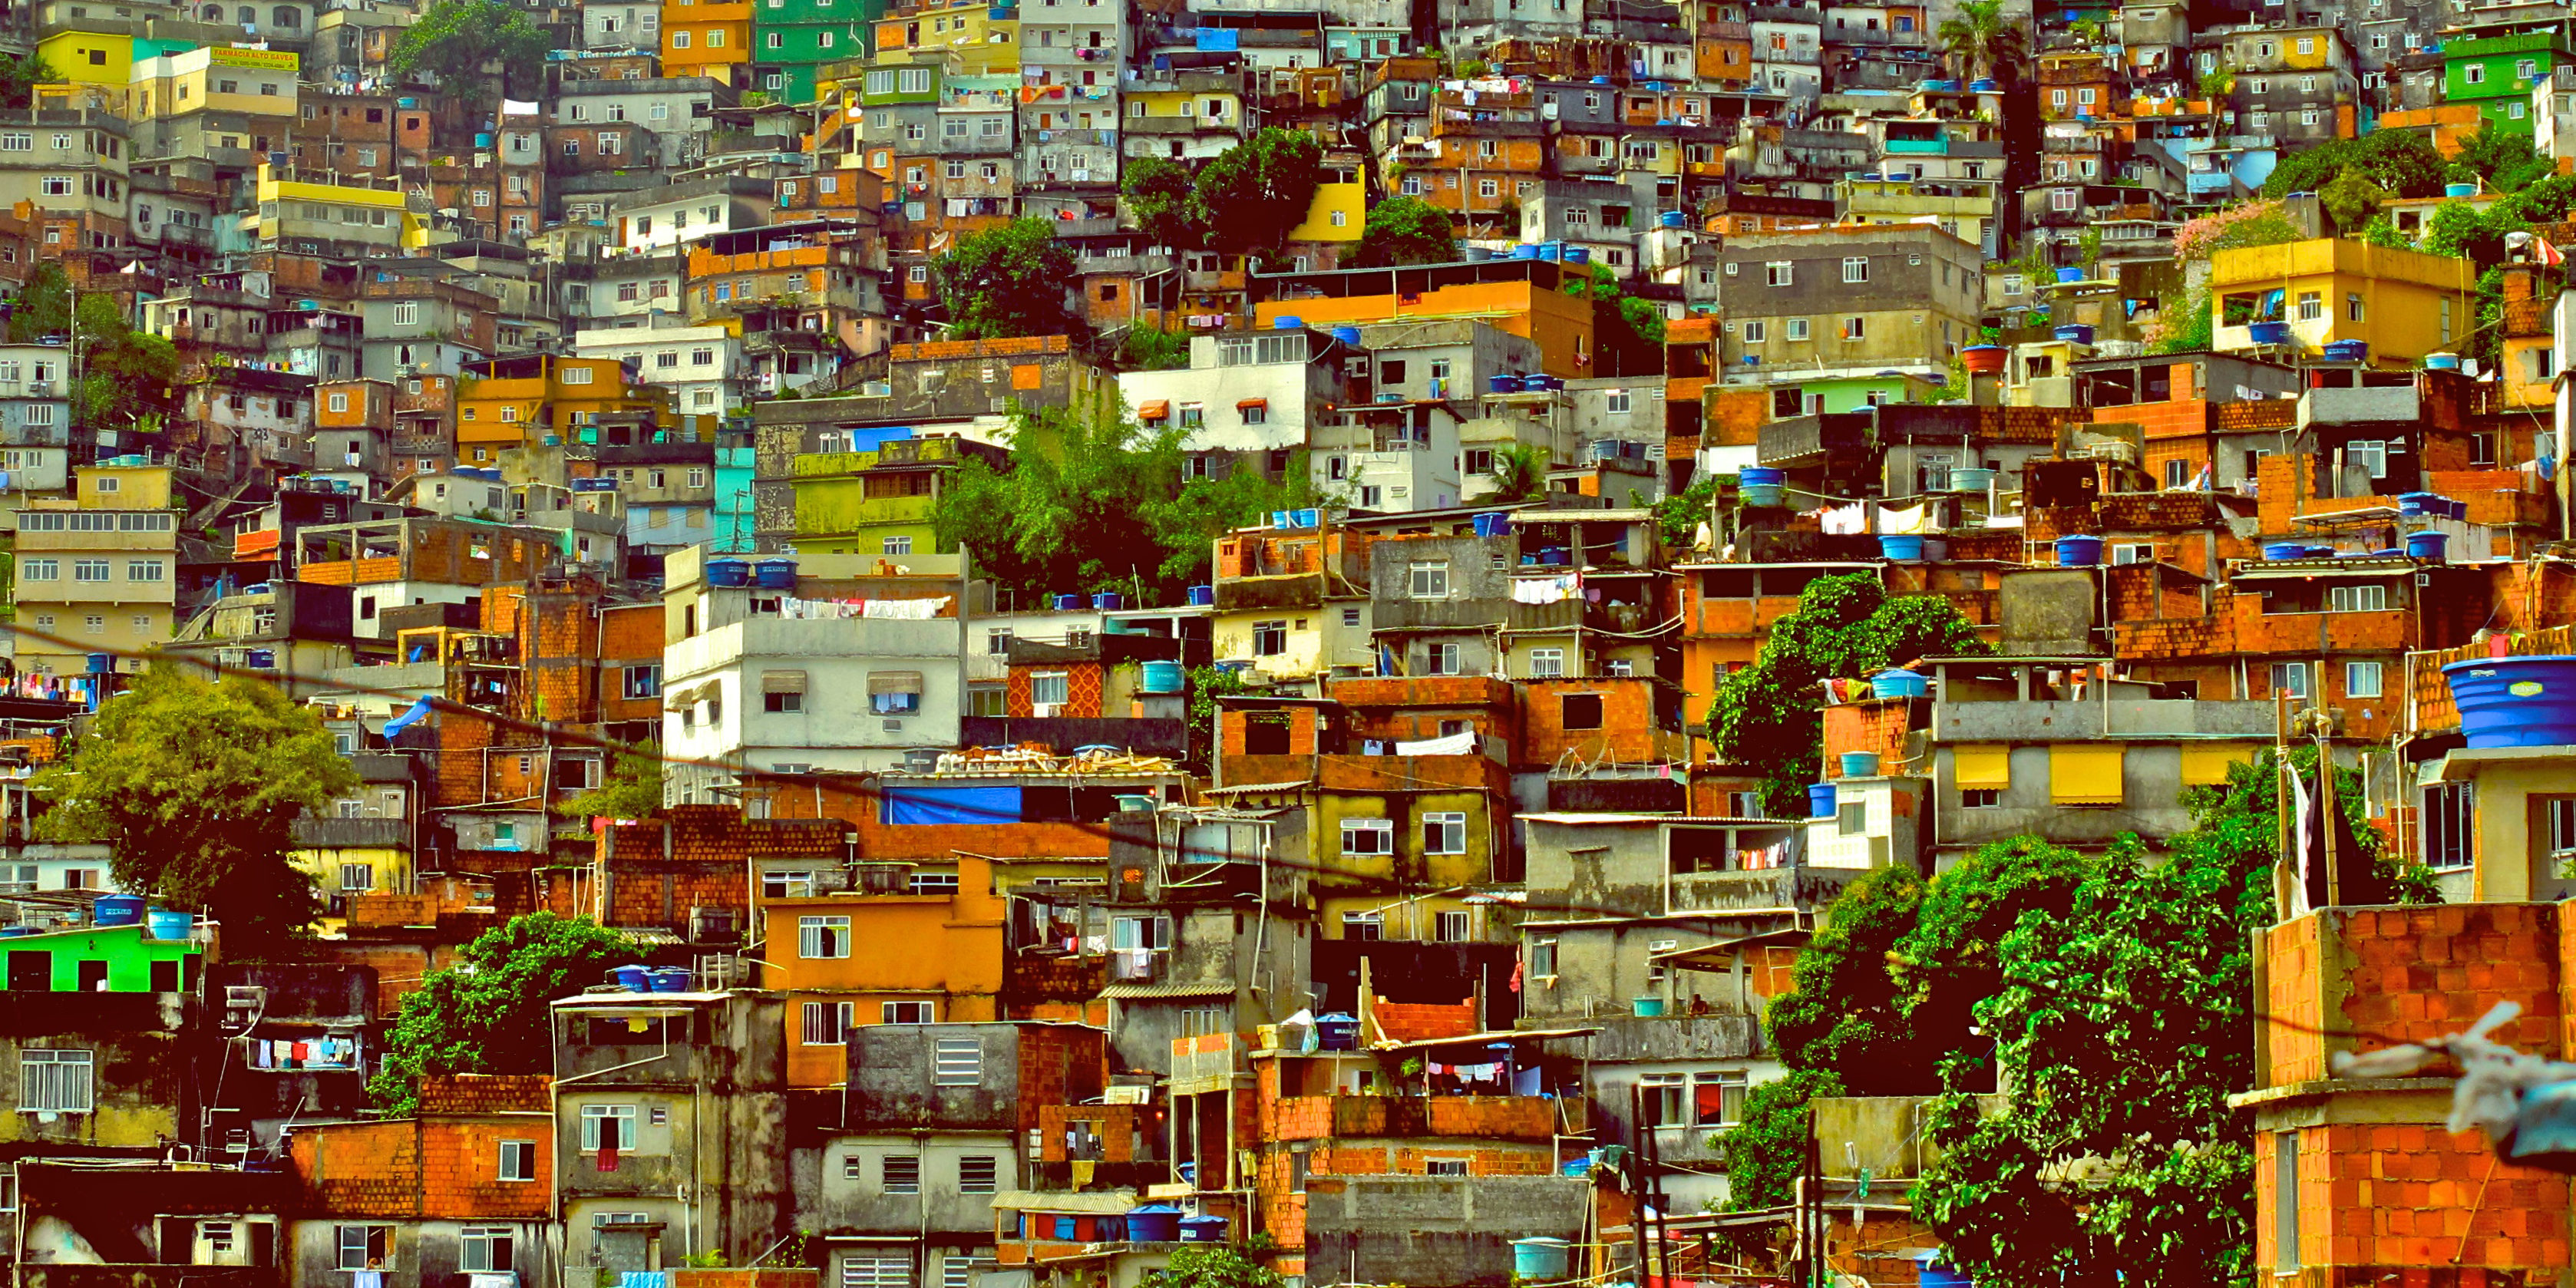 brazylia - favele